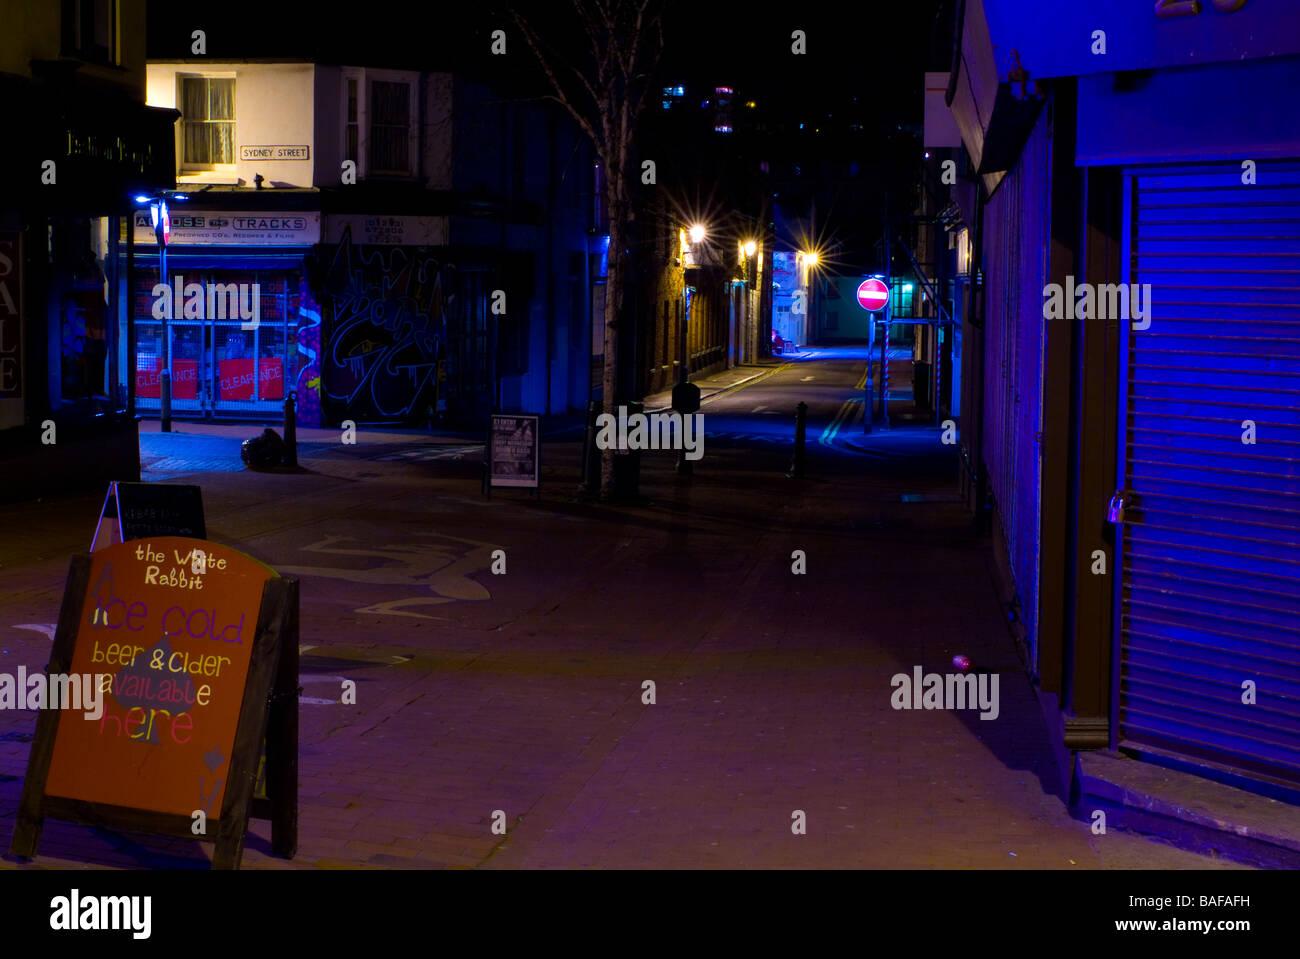 Brighton and Hove Street Scenes at night - Stock Image